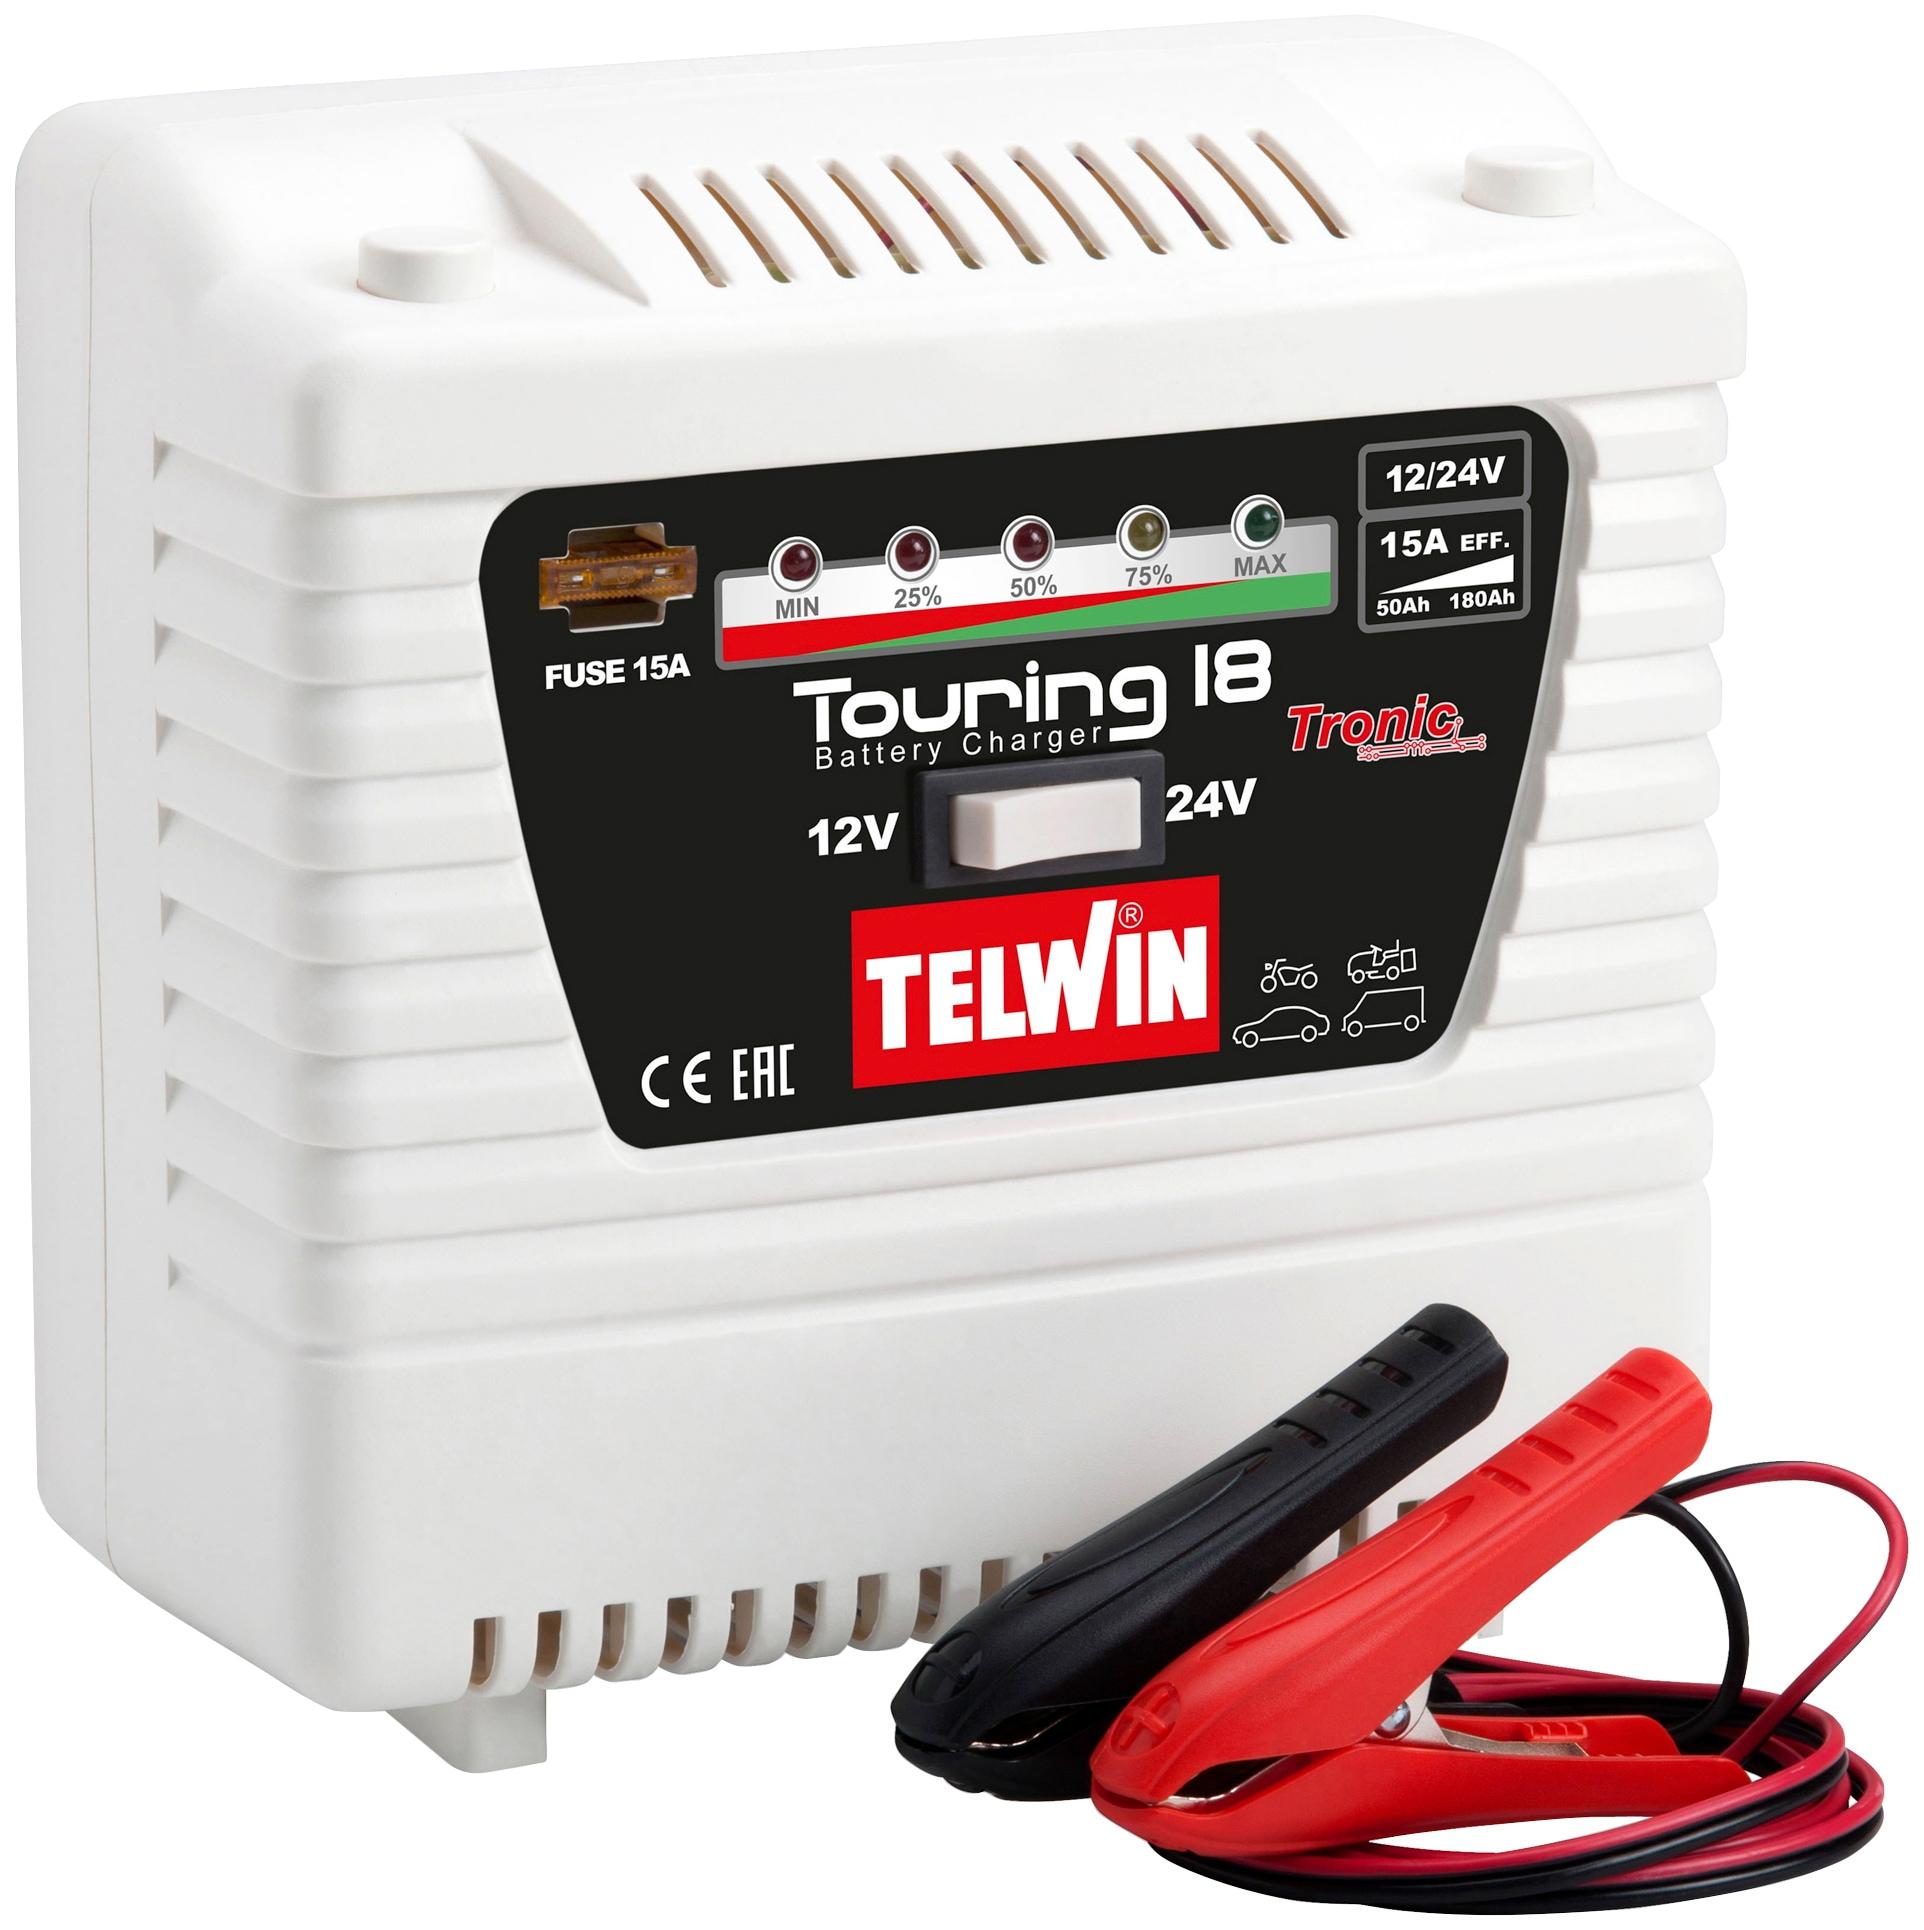 TELWIN Autobatterie-Ladegerät Touring 18, 9000 mA, 12/24 V weiß Autobatterie-Ladegeräte Autozubehör Reifen